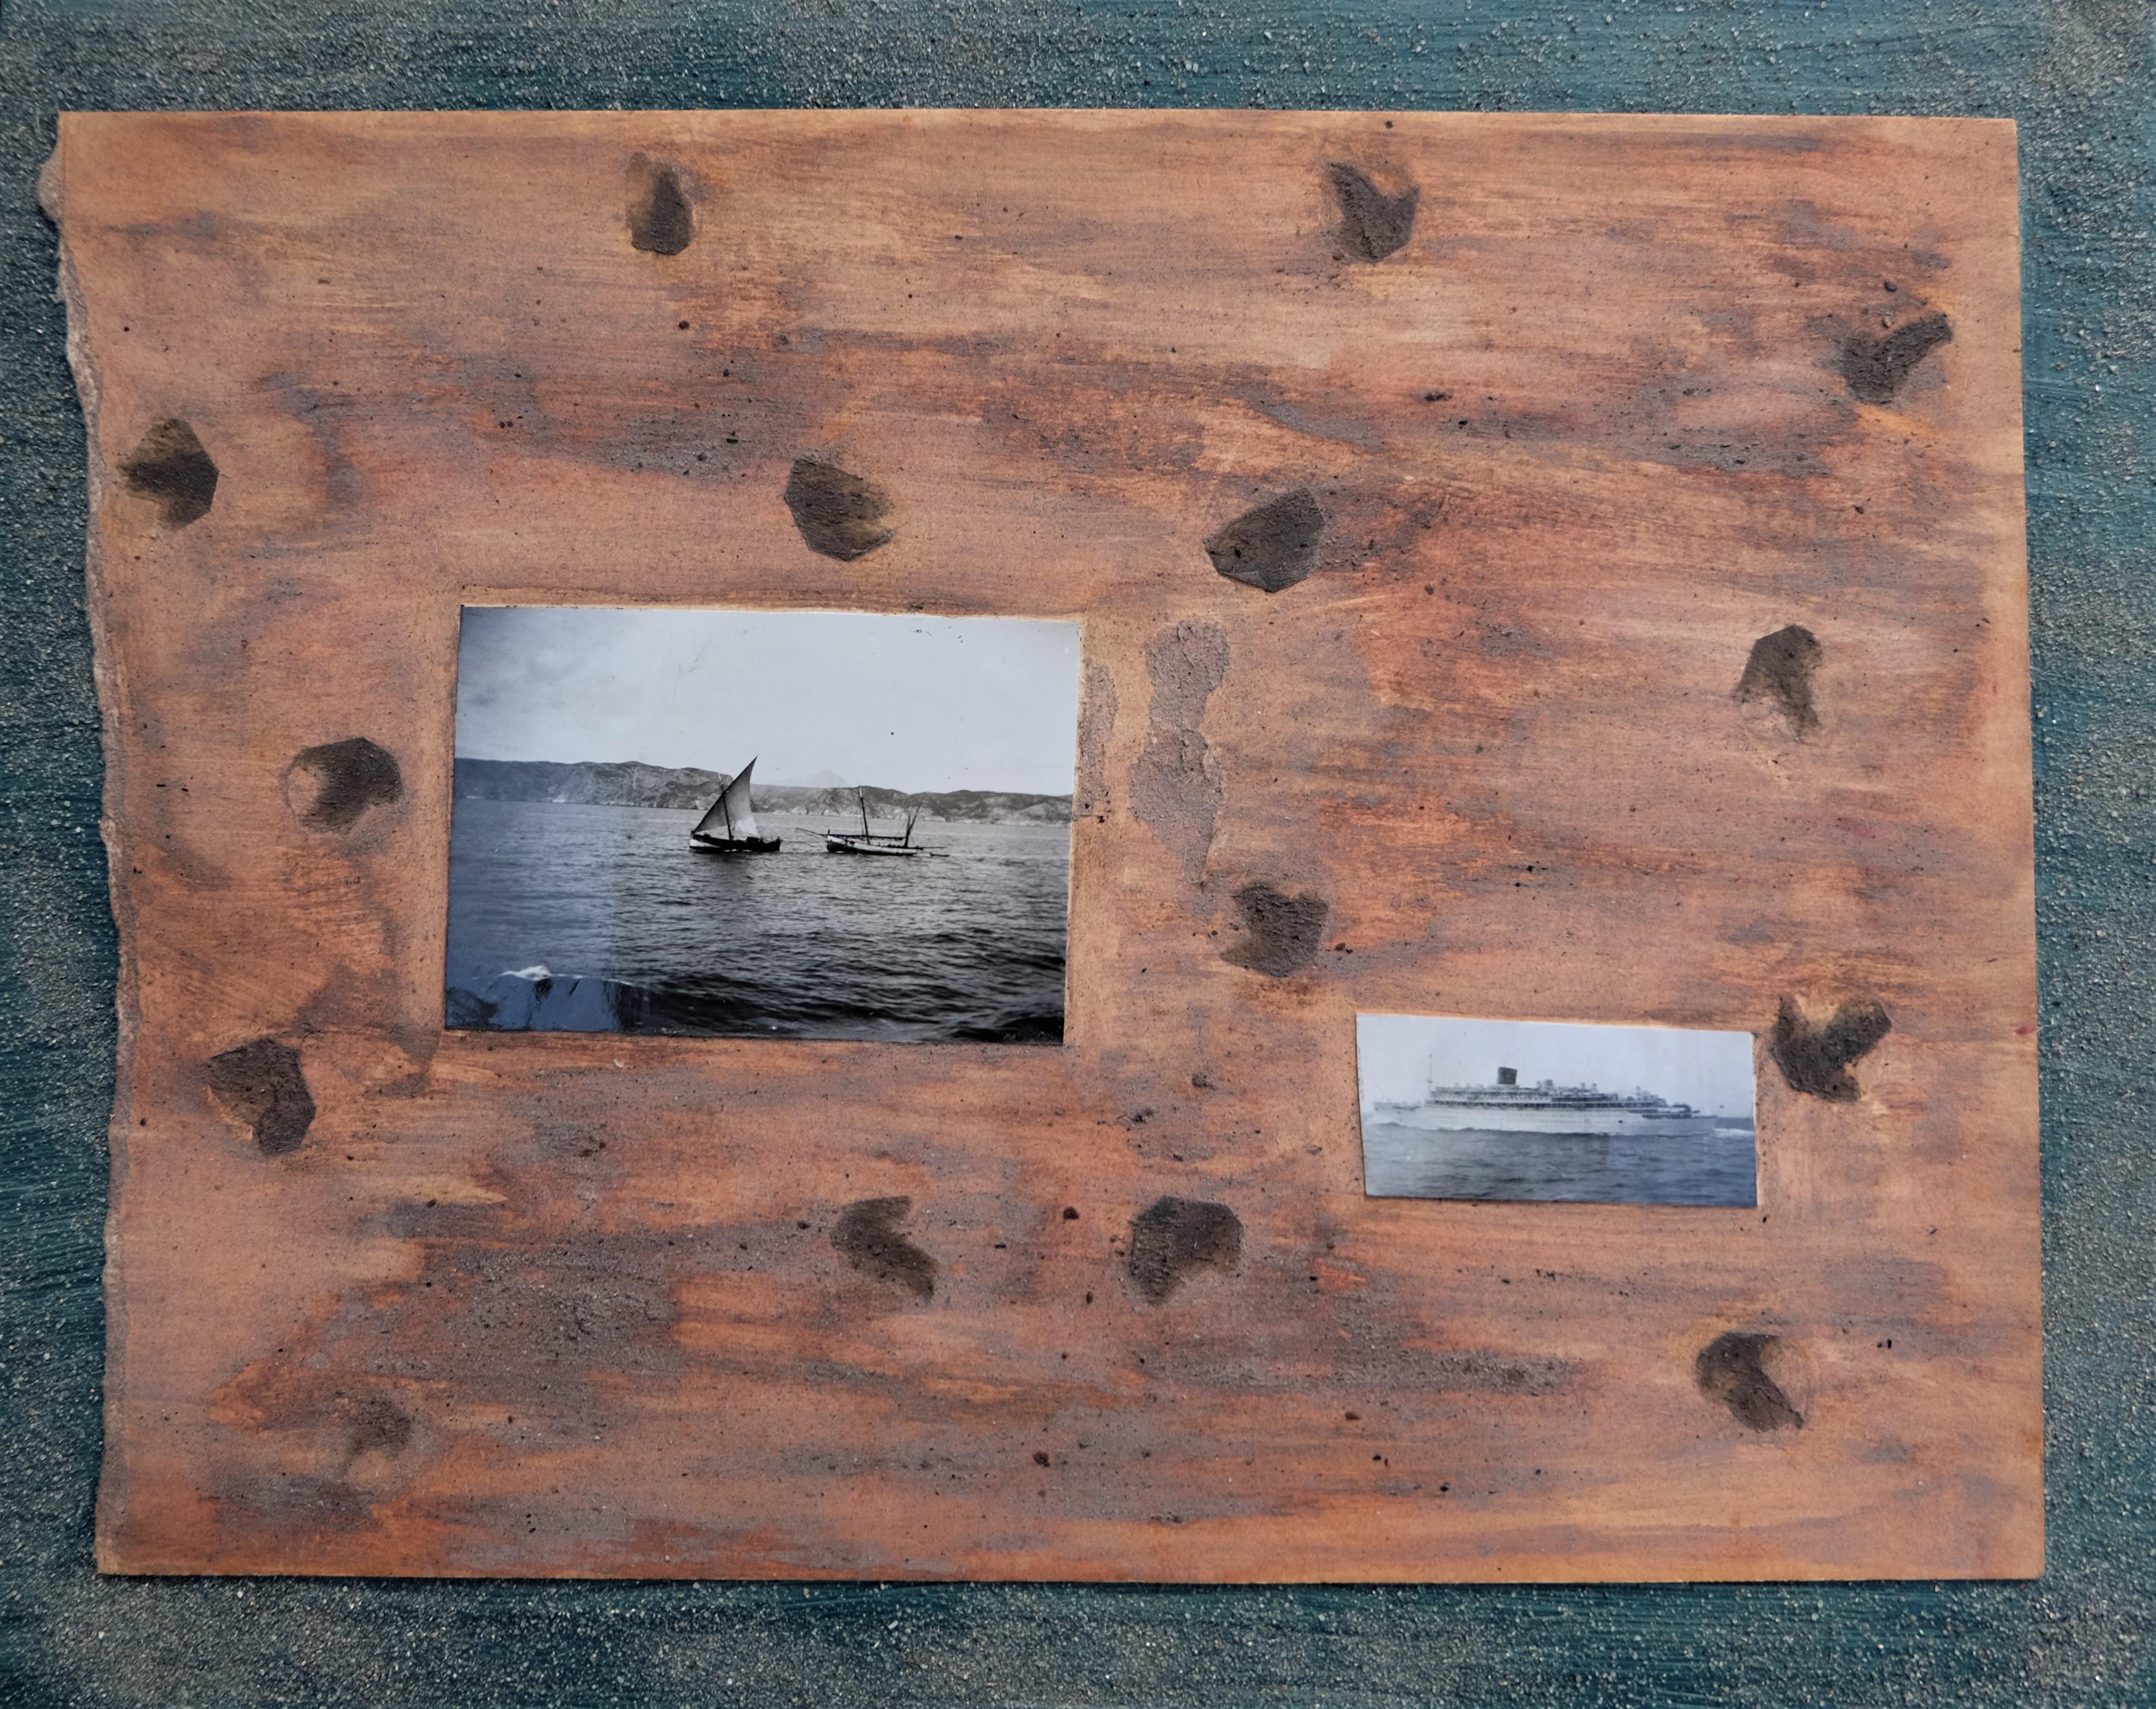 Fondos de pantalla : pintura, collage, historia, textura, vendimia ...